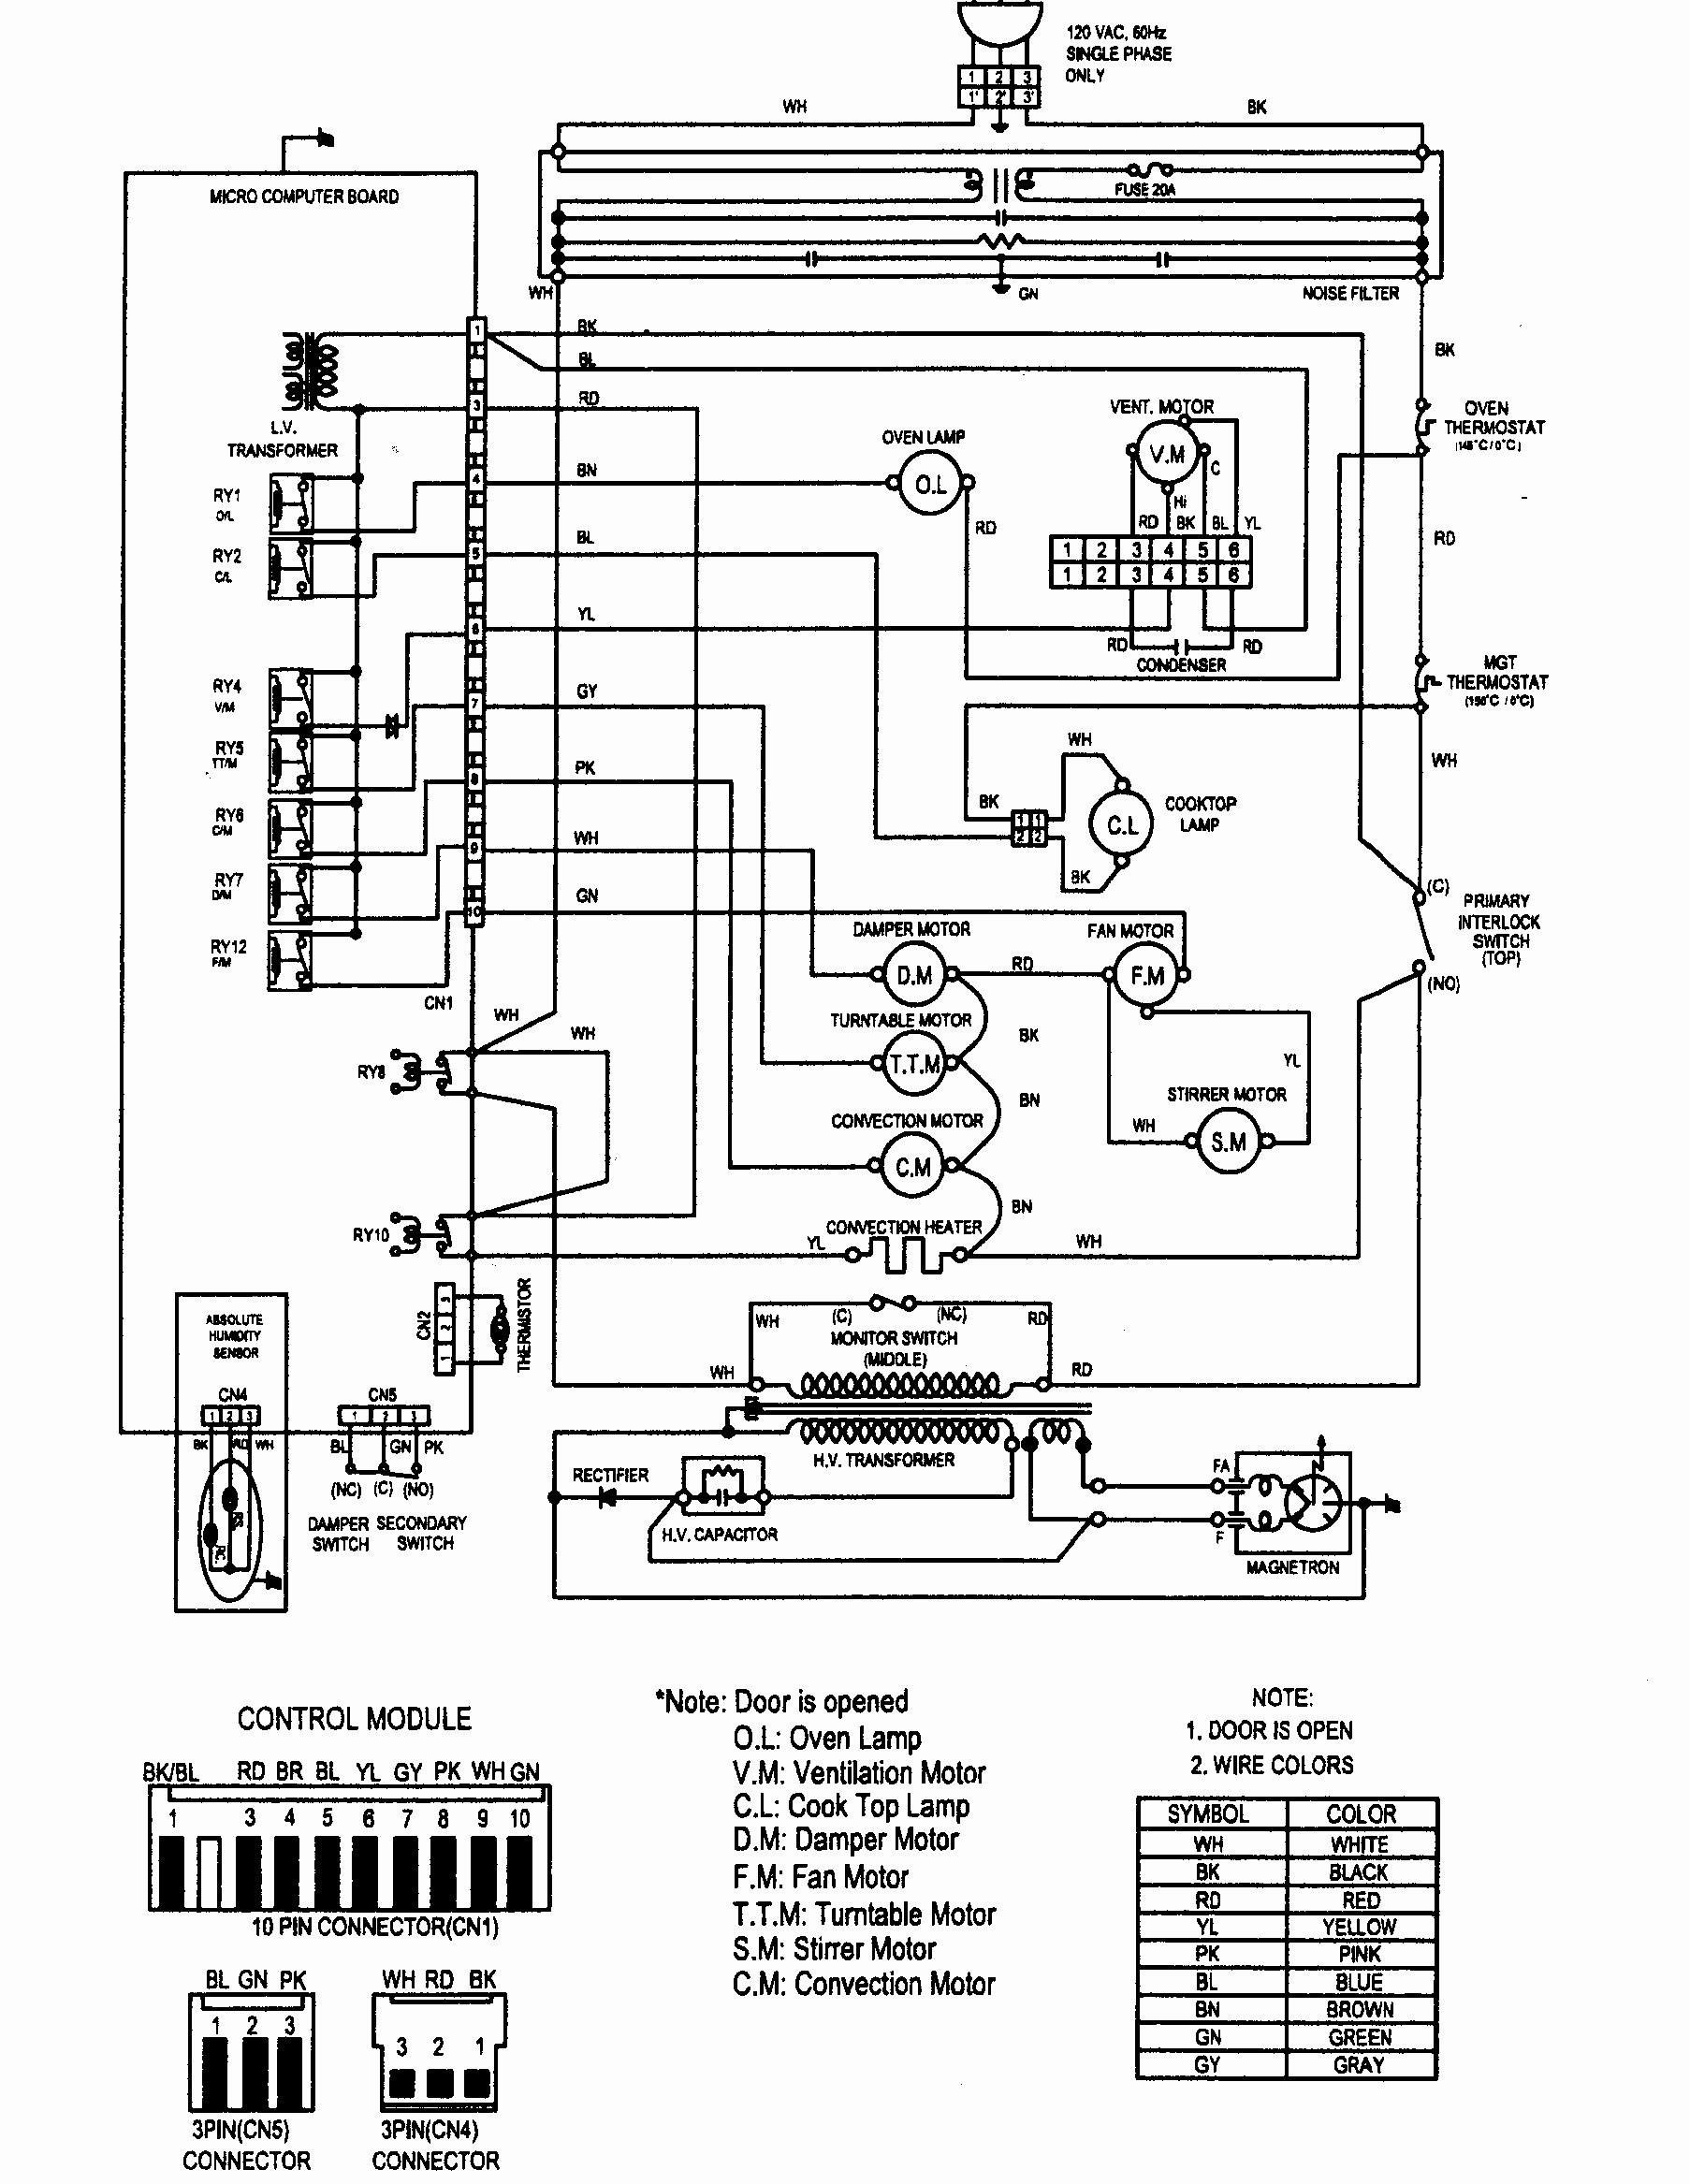 wiring diagram for kenmore elite refrigerator wiring diagram megakenmore compressor wiring diagram wiring diagram gp wiring diagram for kenmore elite refrigerator wiring diagram for kenmore elite refrigerator